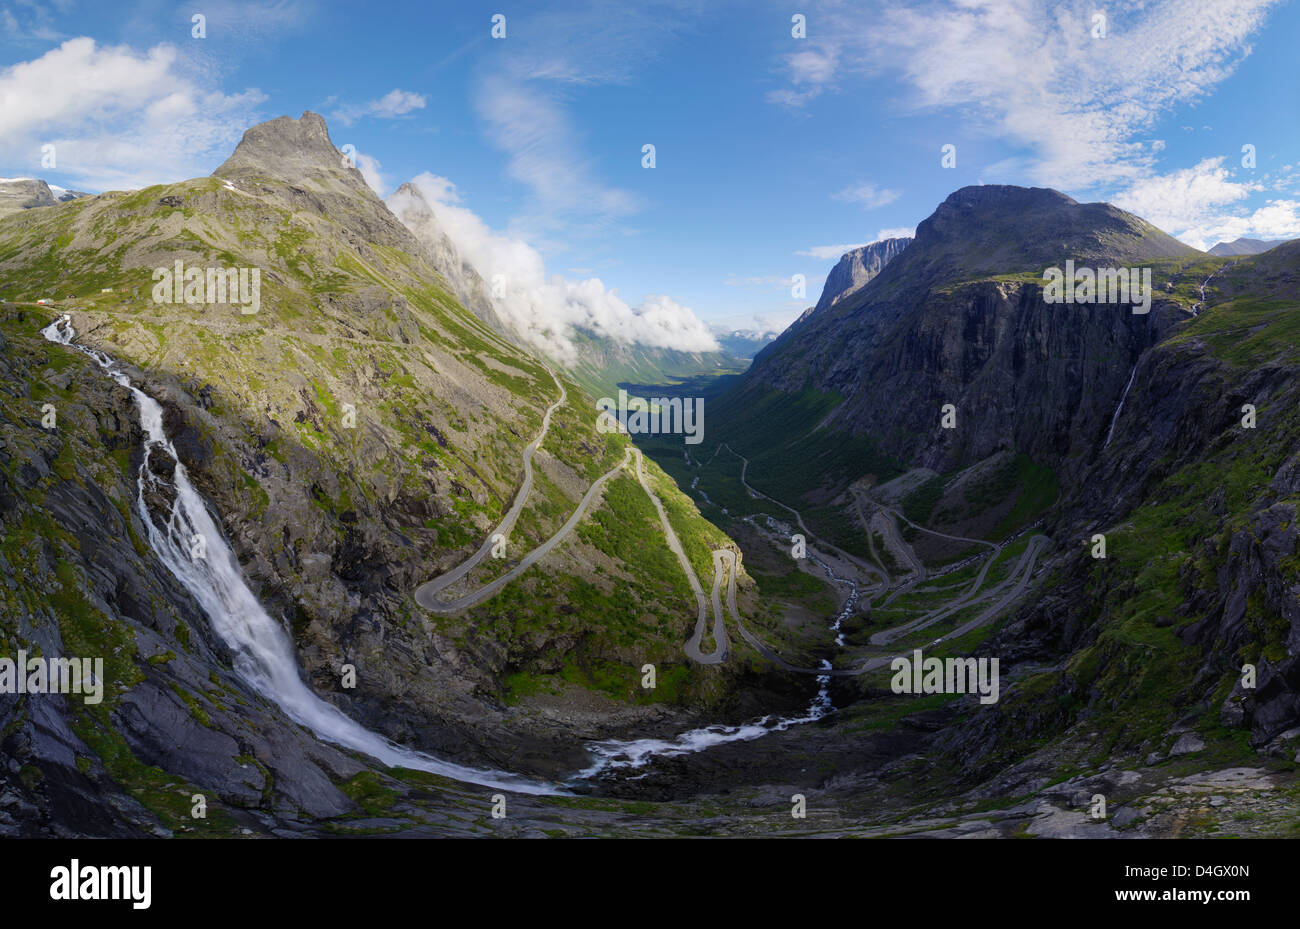 View from Trollstigen viewpoint, More og Romsdal, Norway, Scandinavia - Stock Image